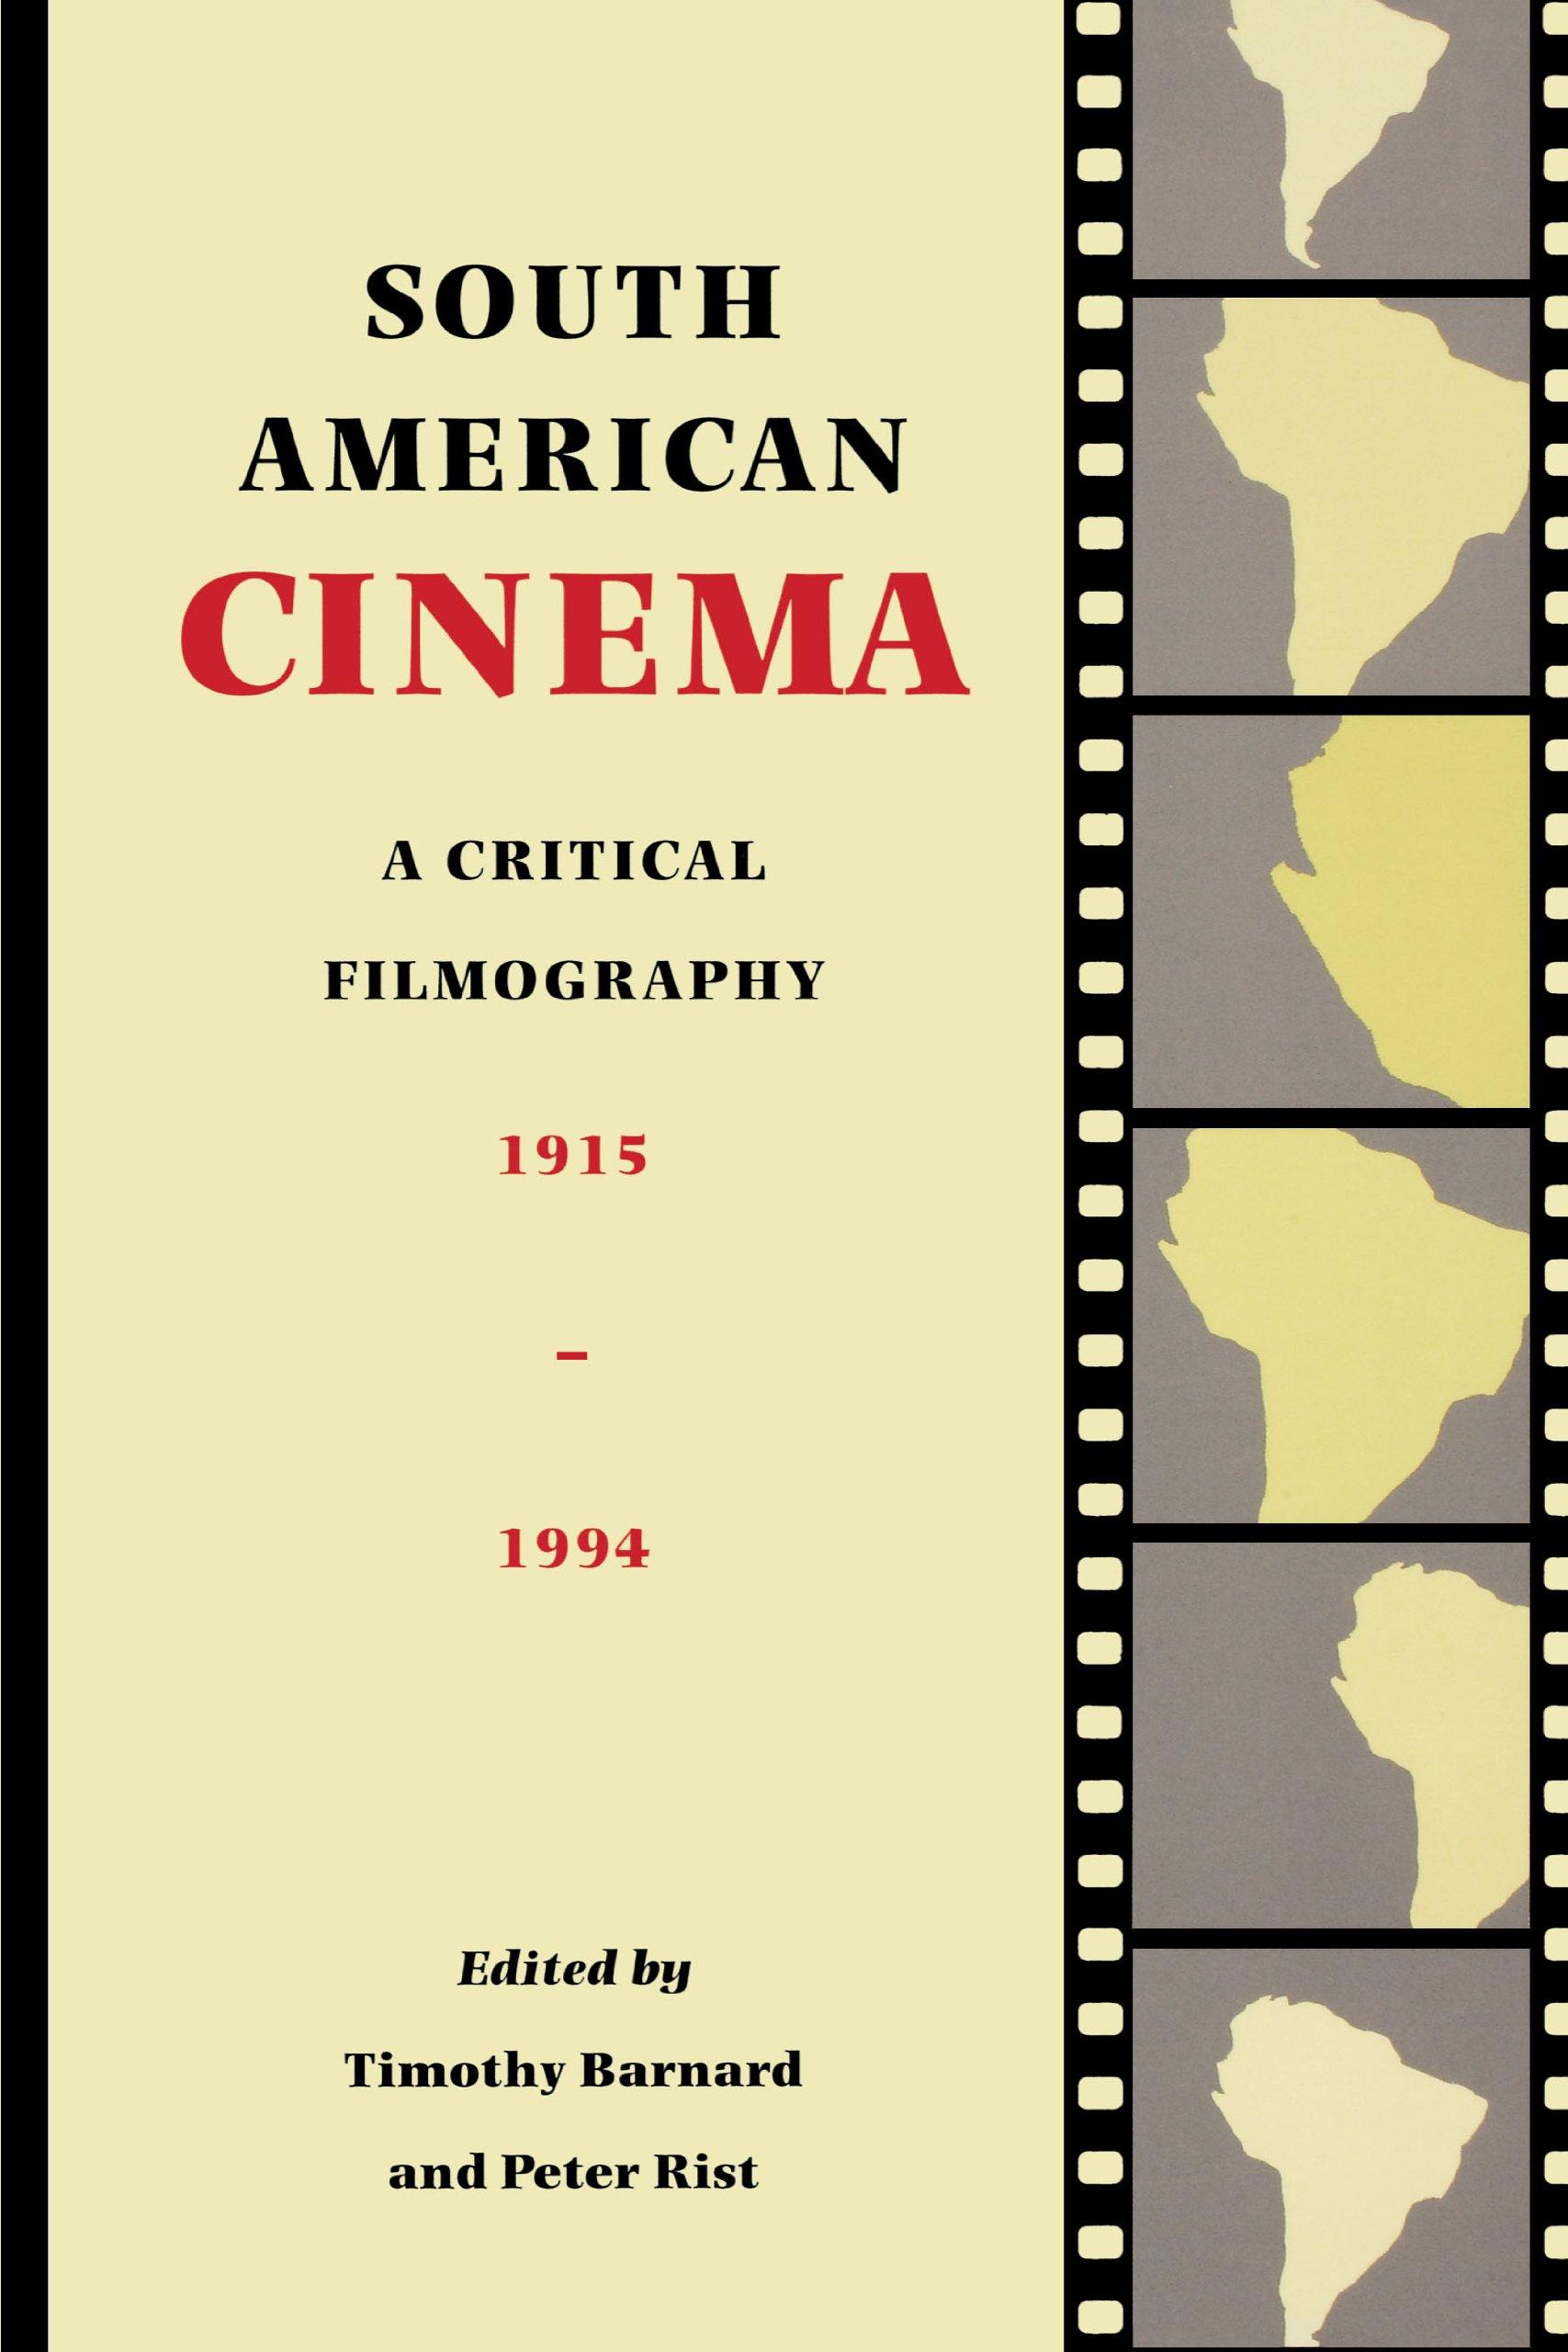 South American Cinema: A Critical Filmography, 1915-1994 pdf